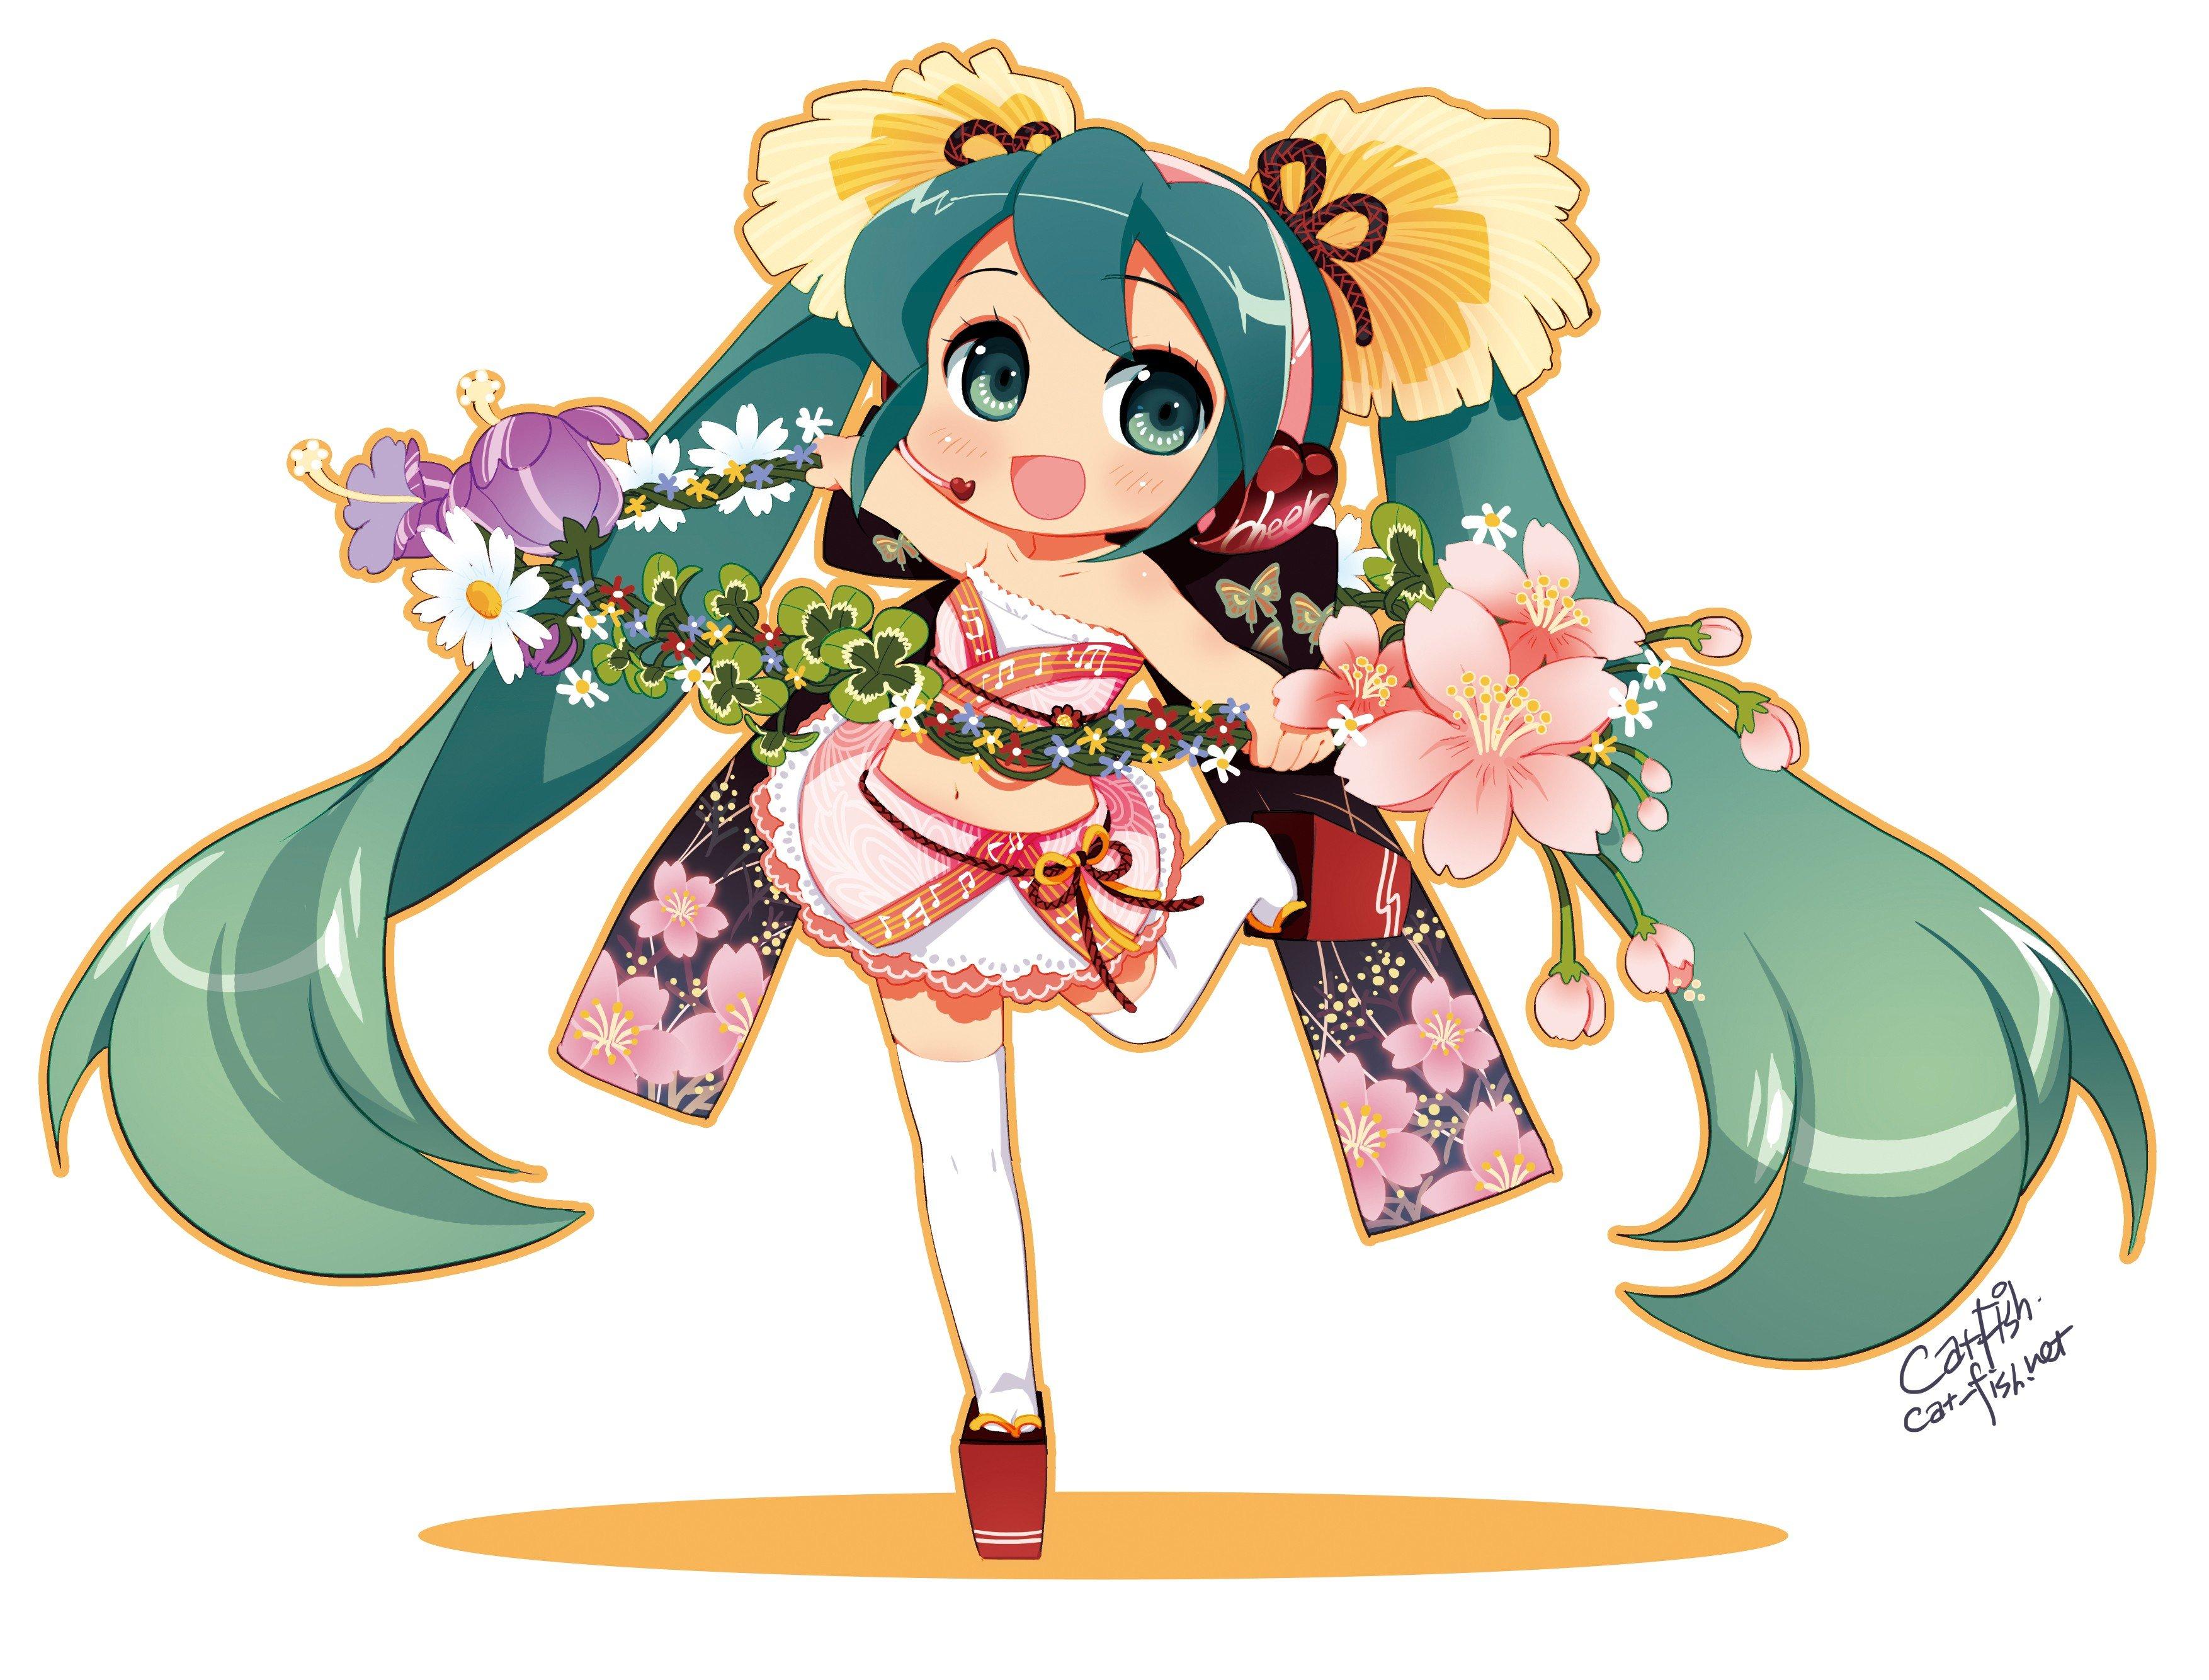 Headphones Vocaloid Flowers Stockings Hatsune Miku Skirts